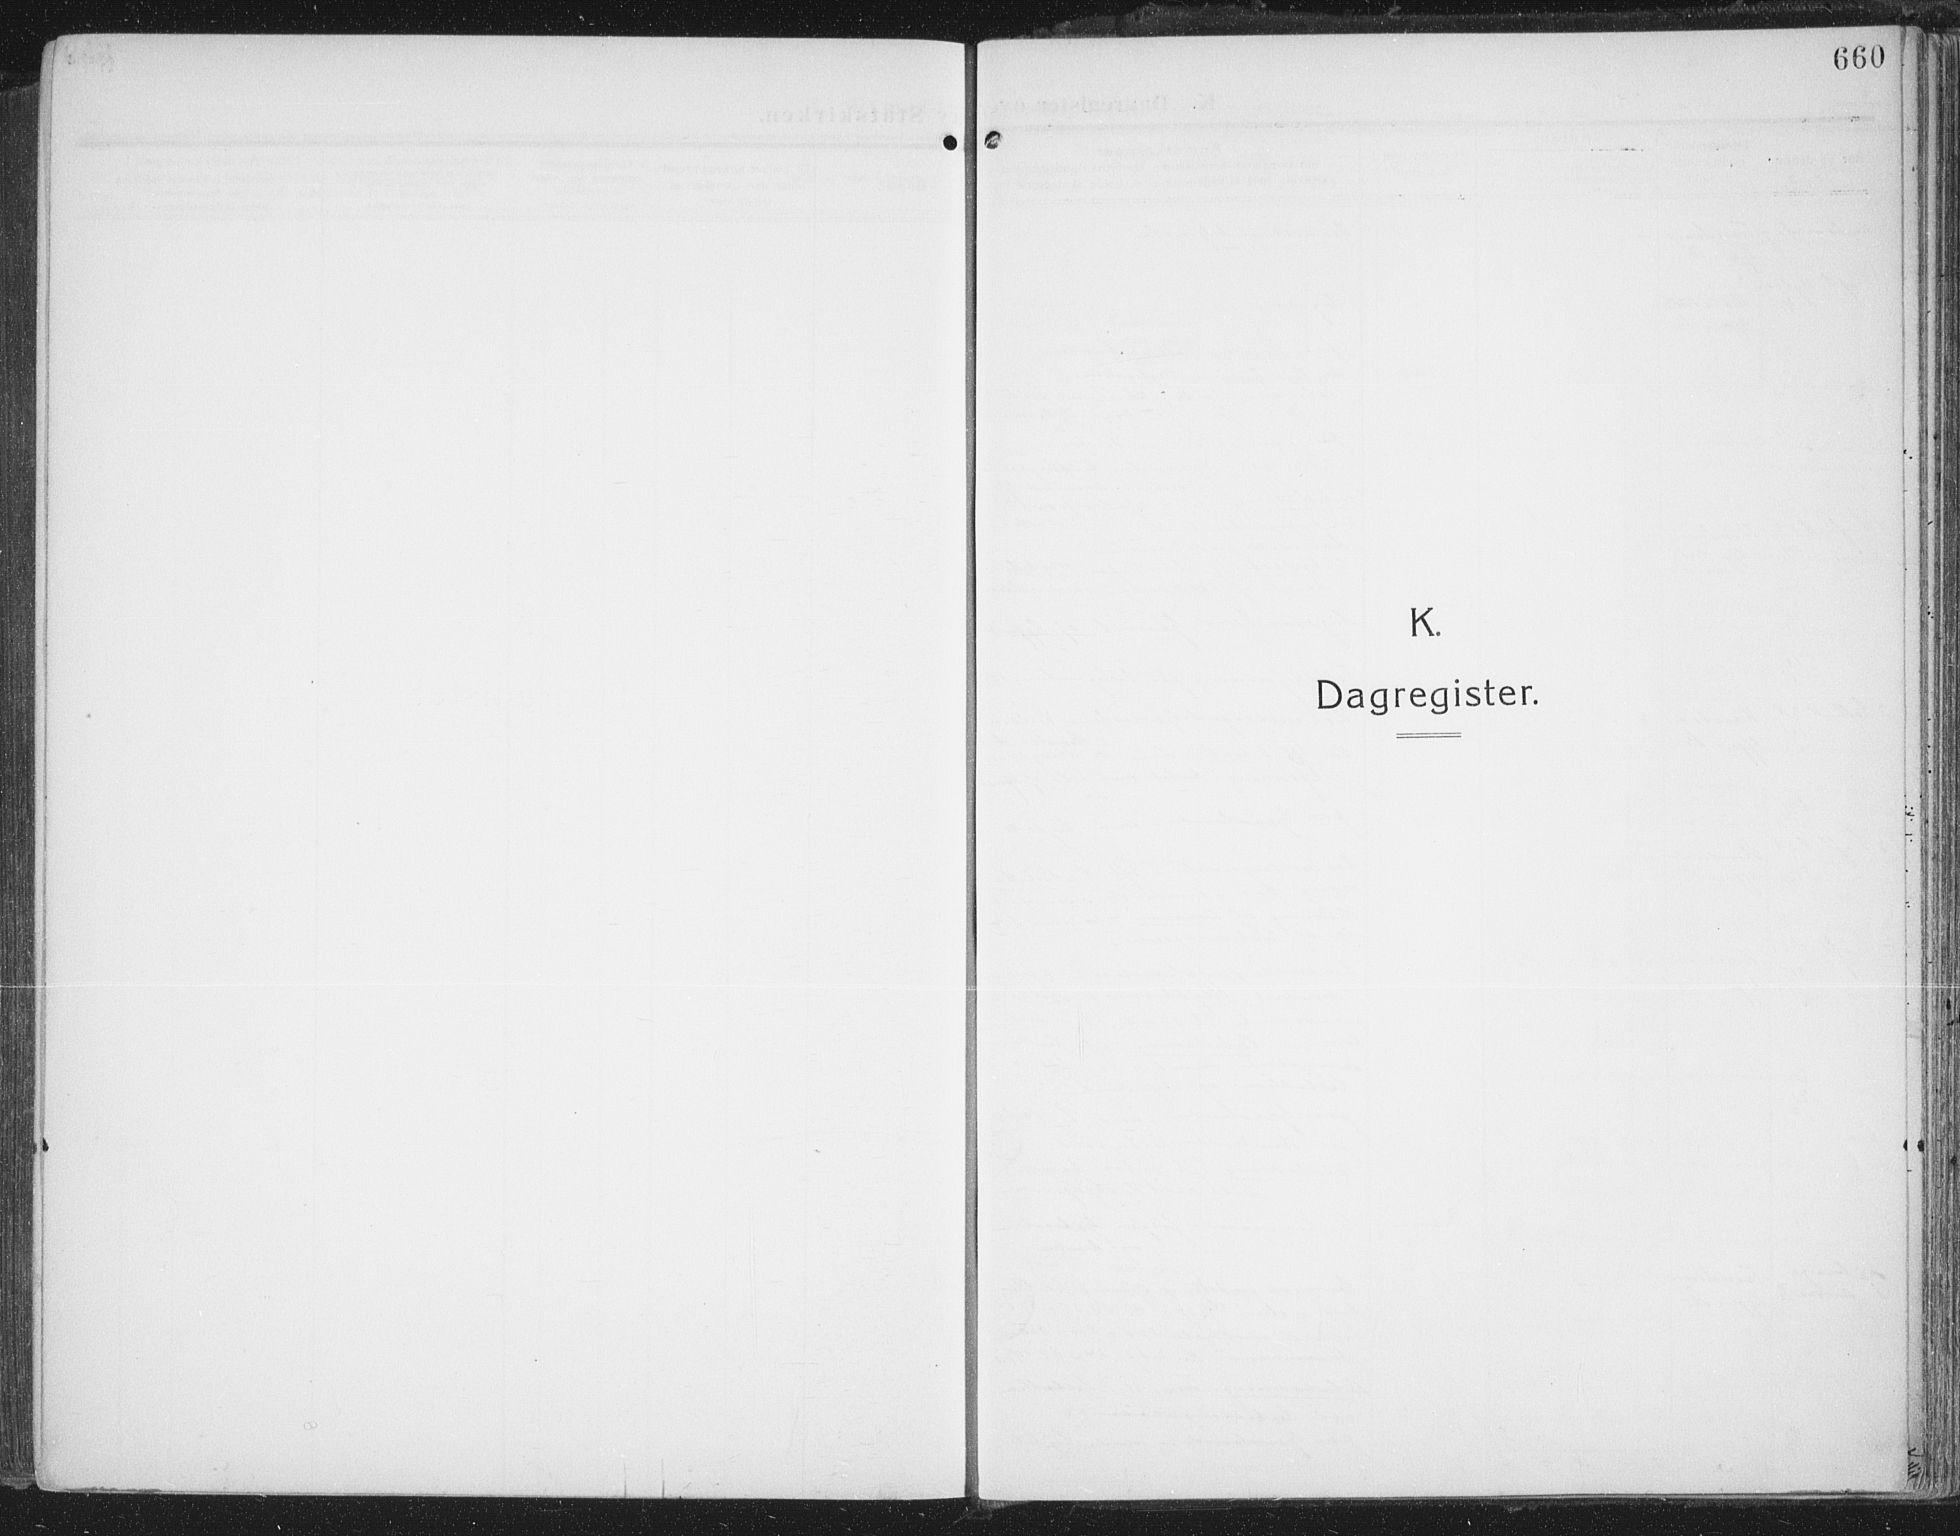 SATØ, Trondenes sokneprestkontor, H/Ha/L0018kirke: Parish register (official) no. 18, 1909-1918, p. 660